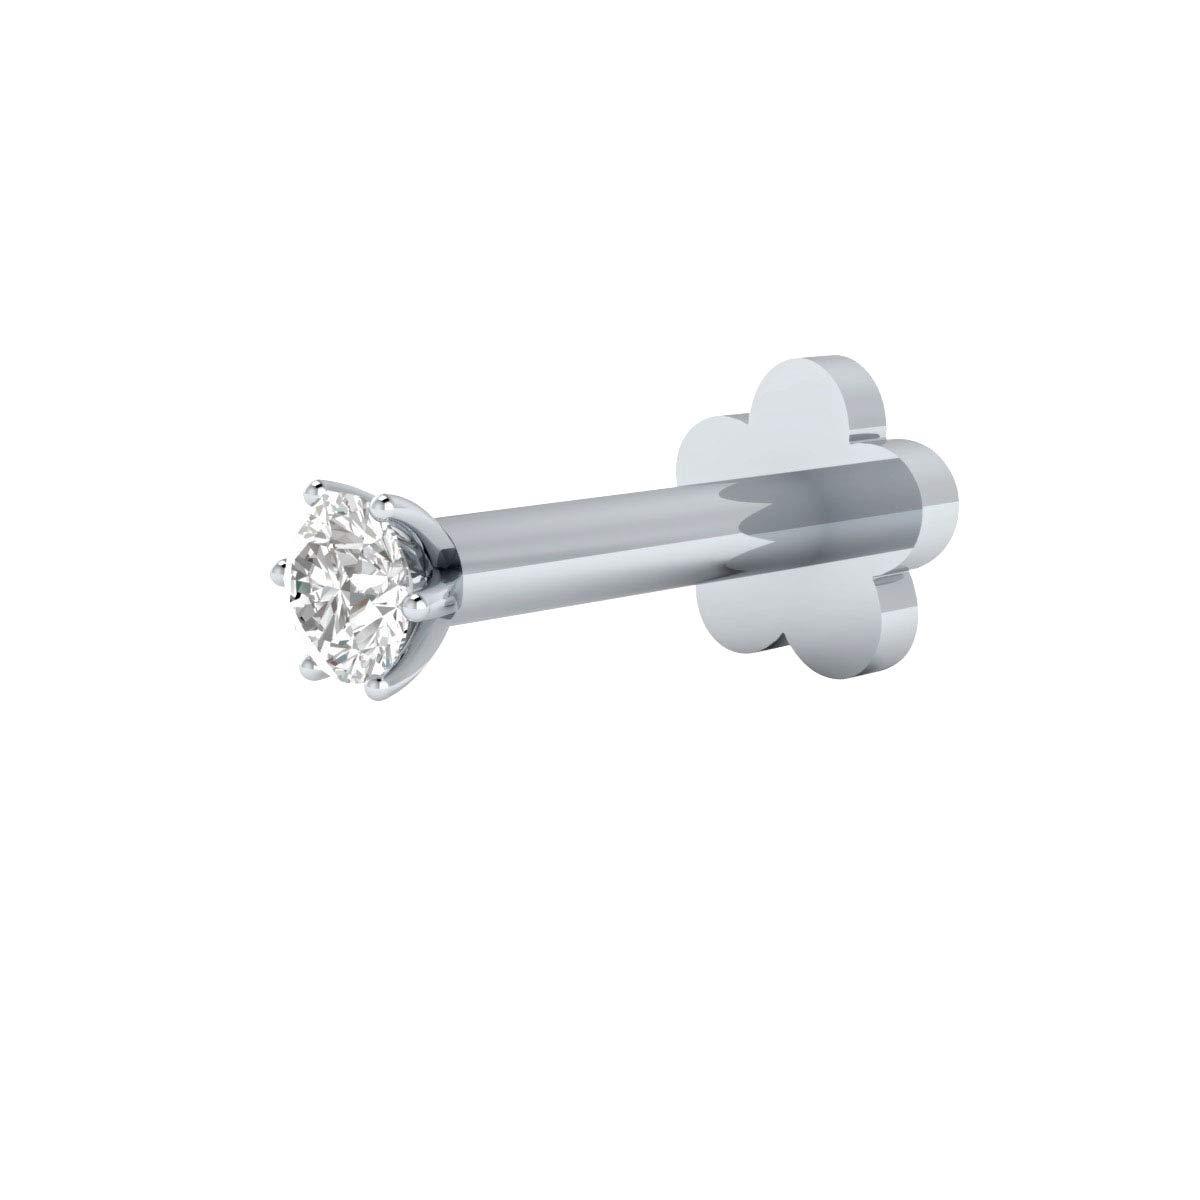 Animas Jewels 1.7mm Natural Diamond Nose Lip Labret Monroe Ring Screw Stud Nose Pin Solid 14k White Gold Certified (6, White-Gold) by Animas Jewels